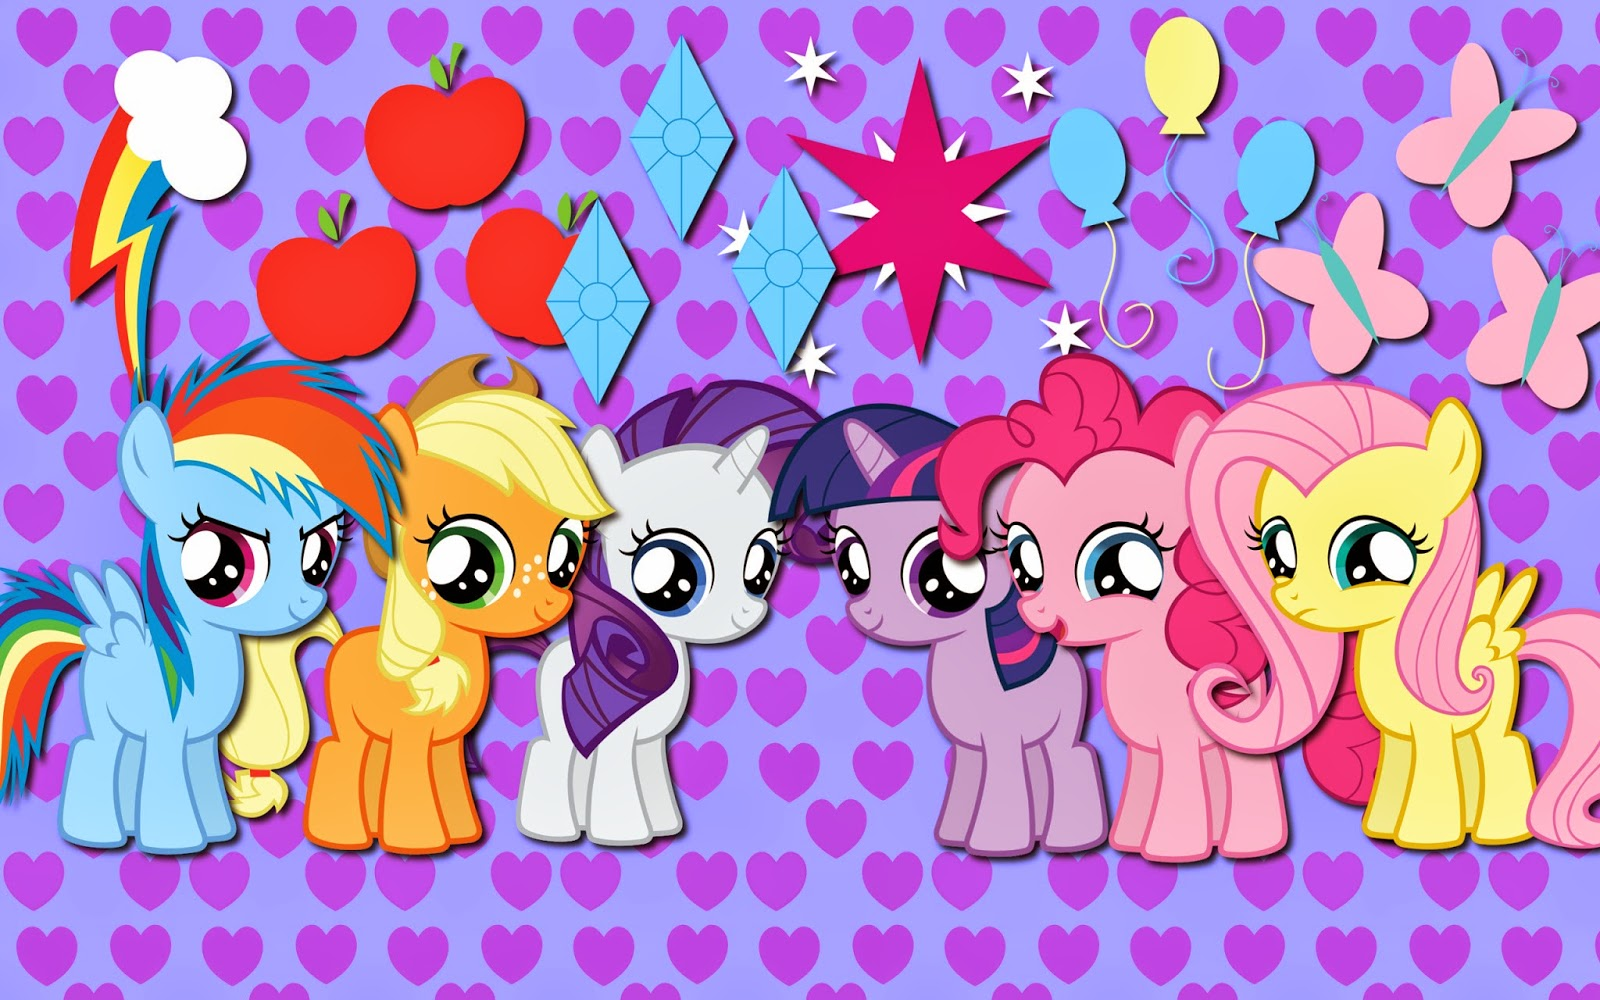 Kumpulan Contoh Sketsa Gambar Kartun My Litlle Pony Sketsa Gambar